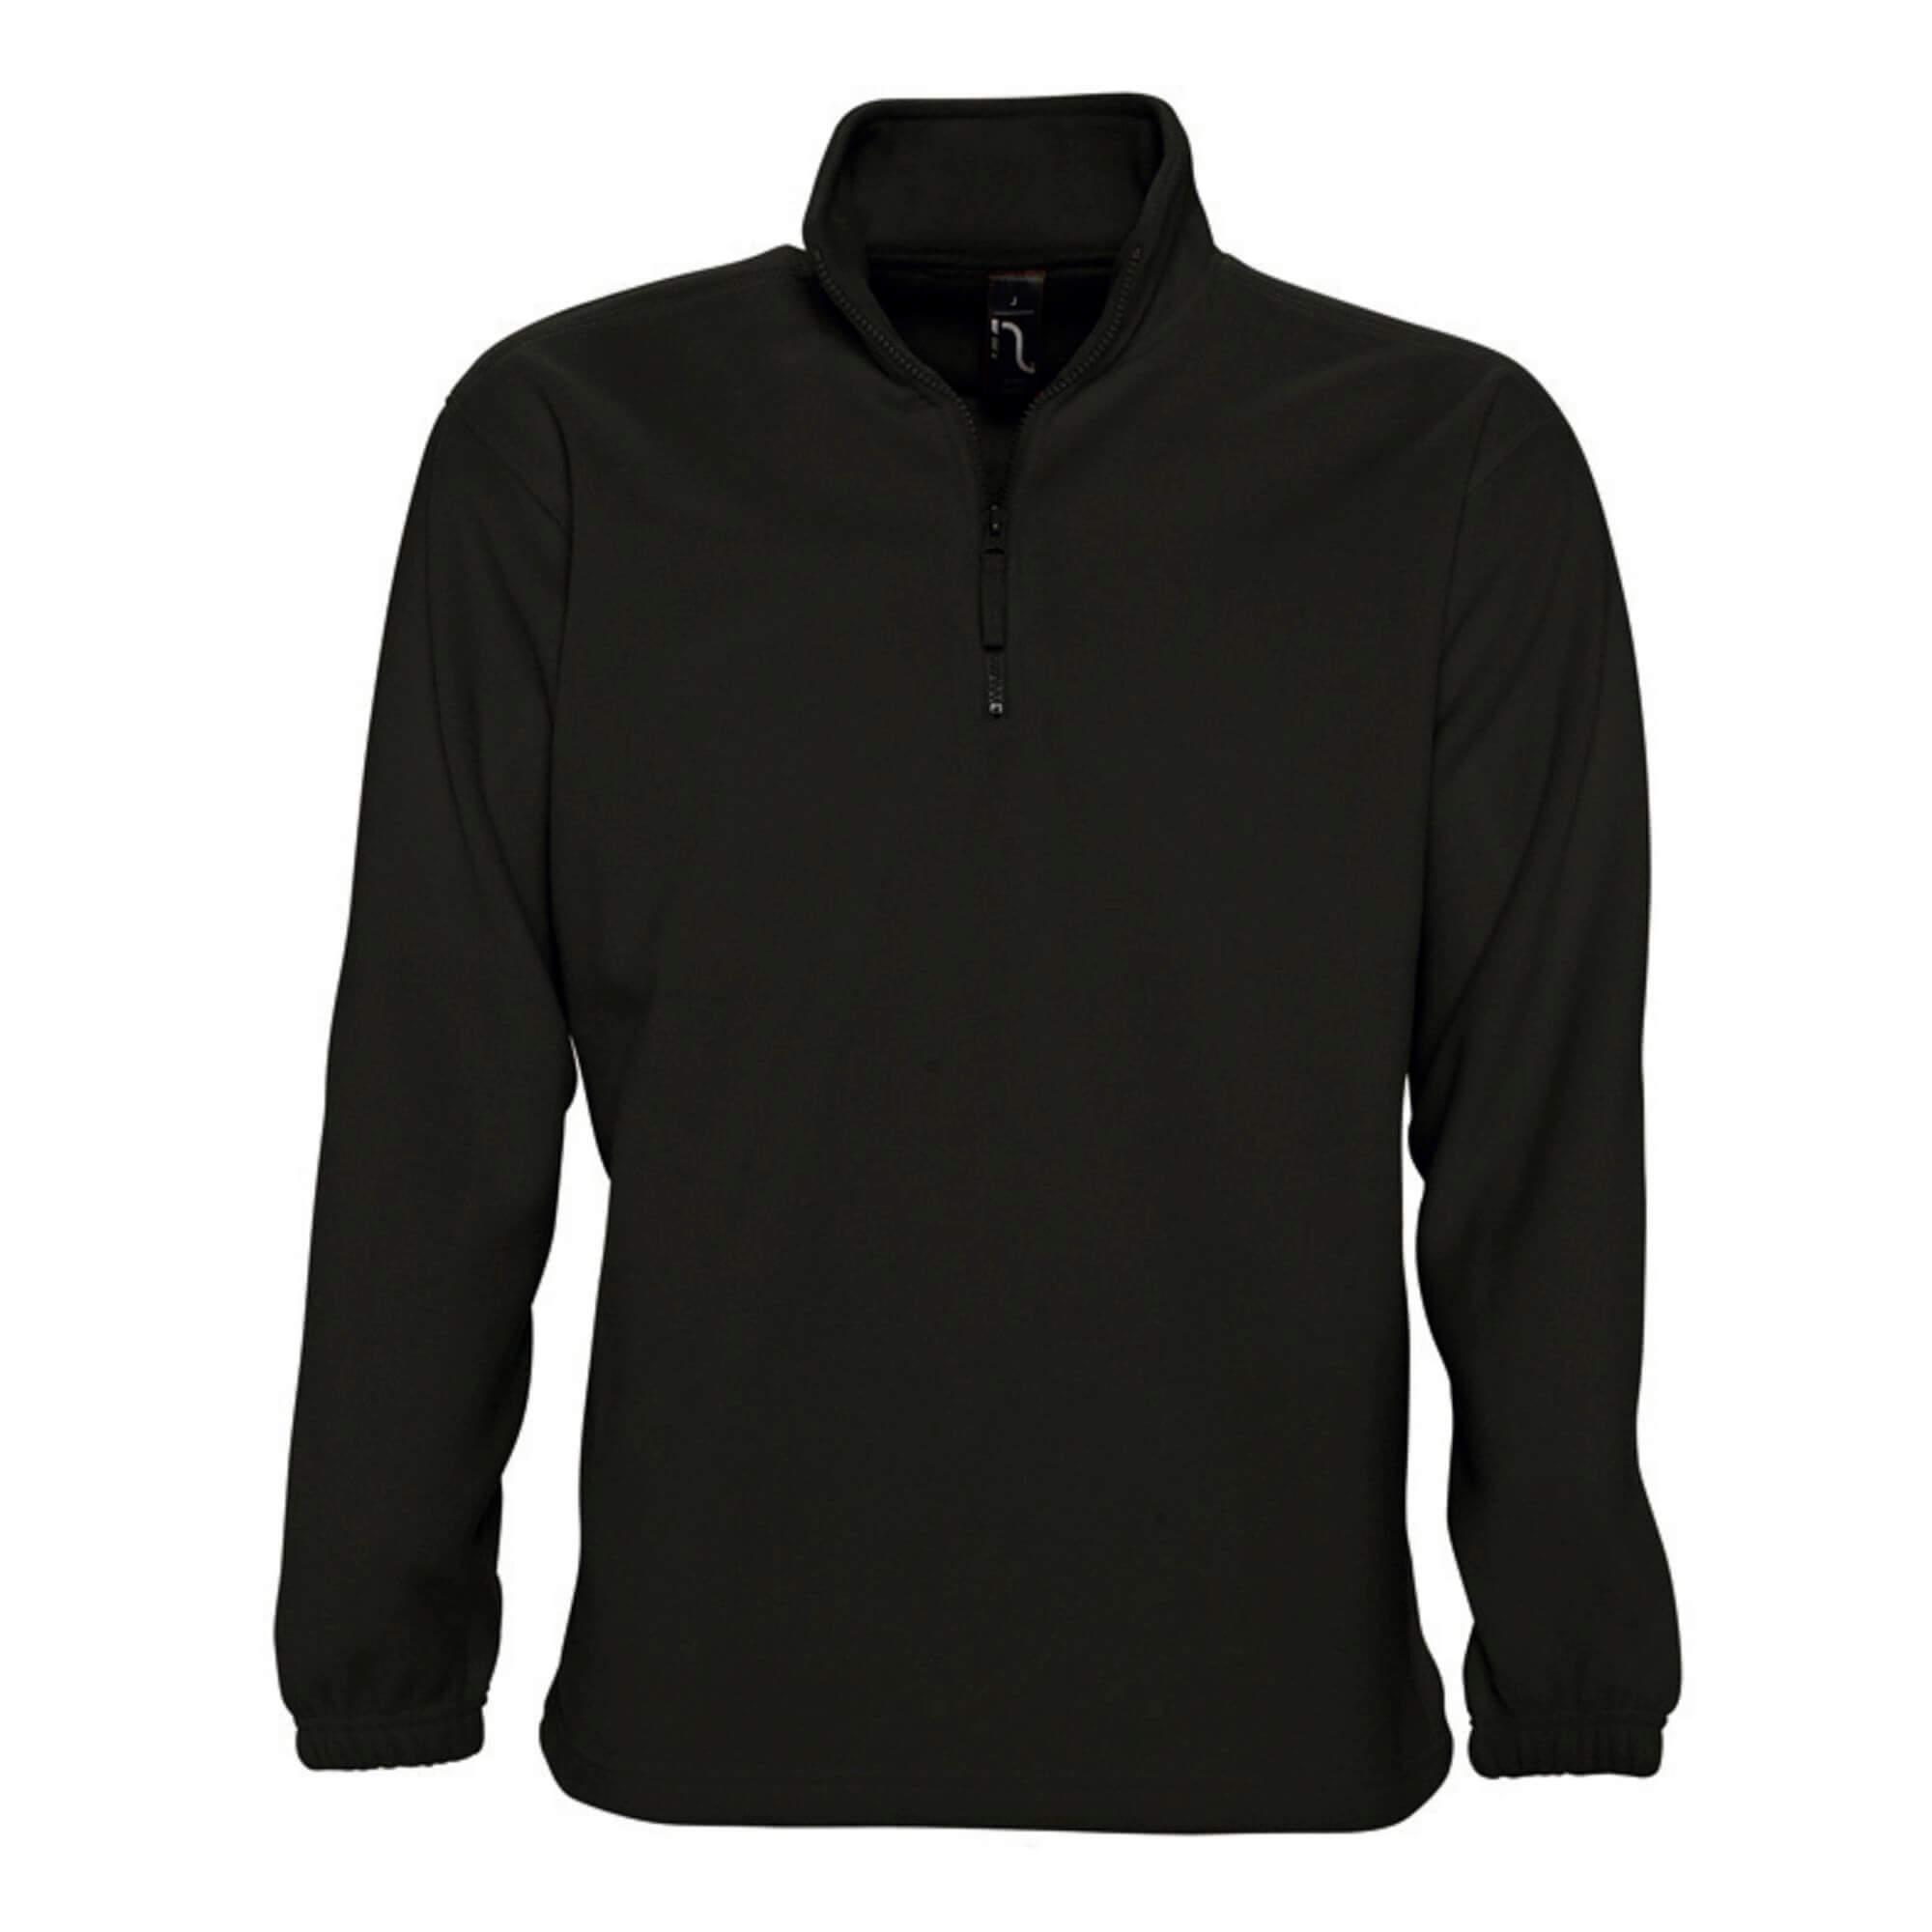 Флисовая куртка мужская черная - VT STYLE